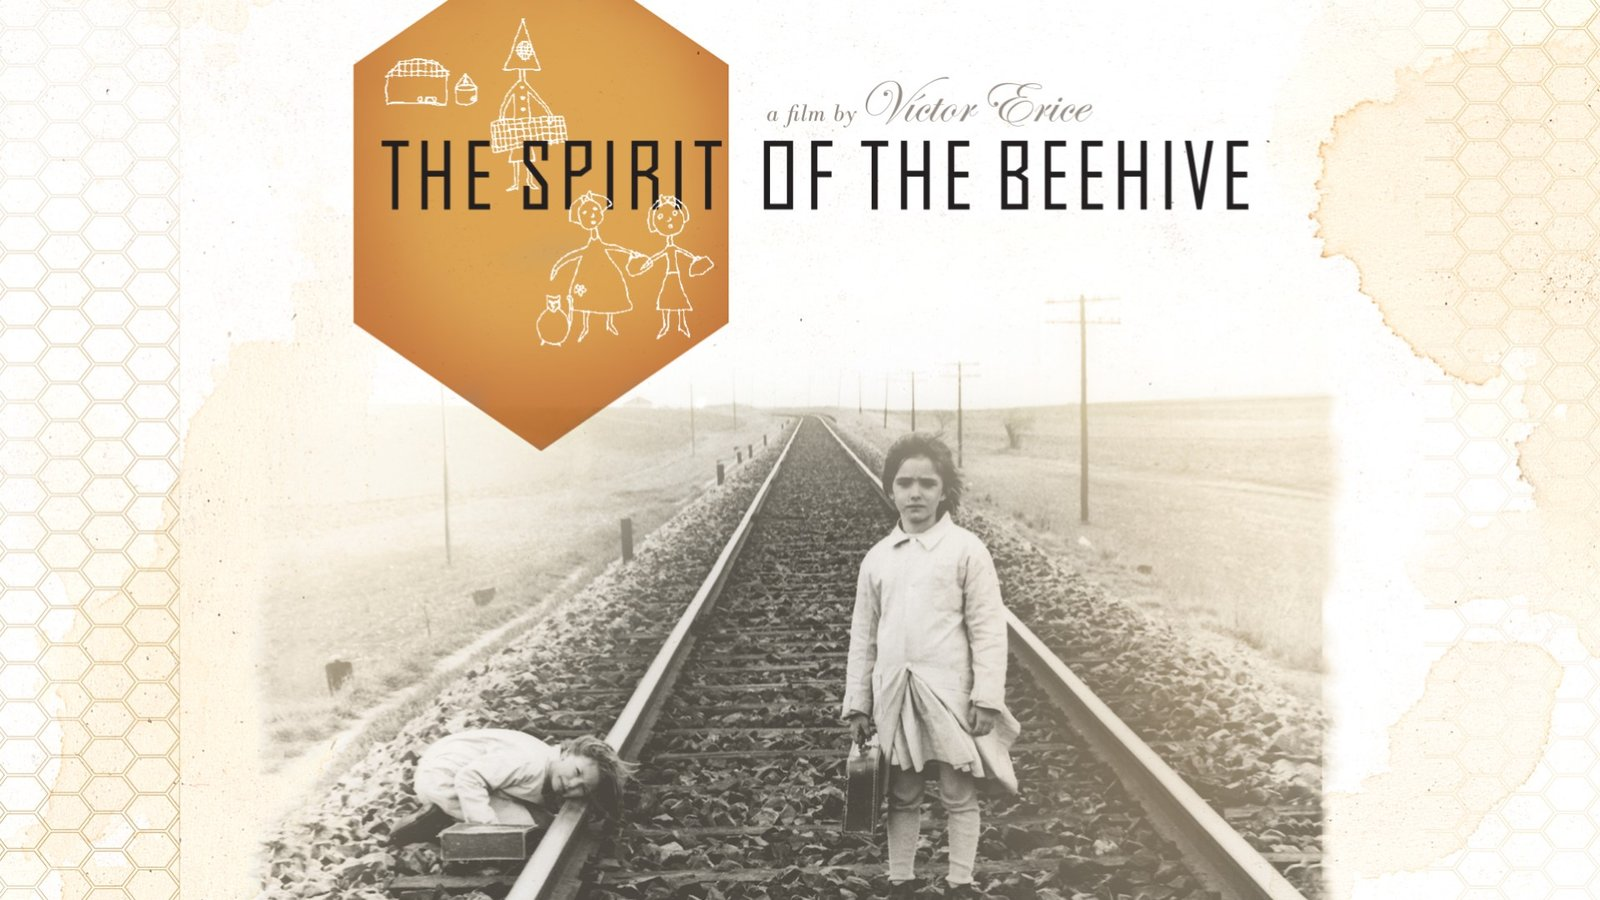 The Spirit of the Beehive - El espíritu de la colmena